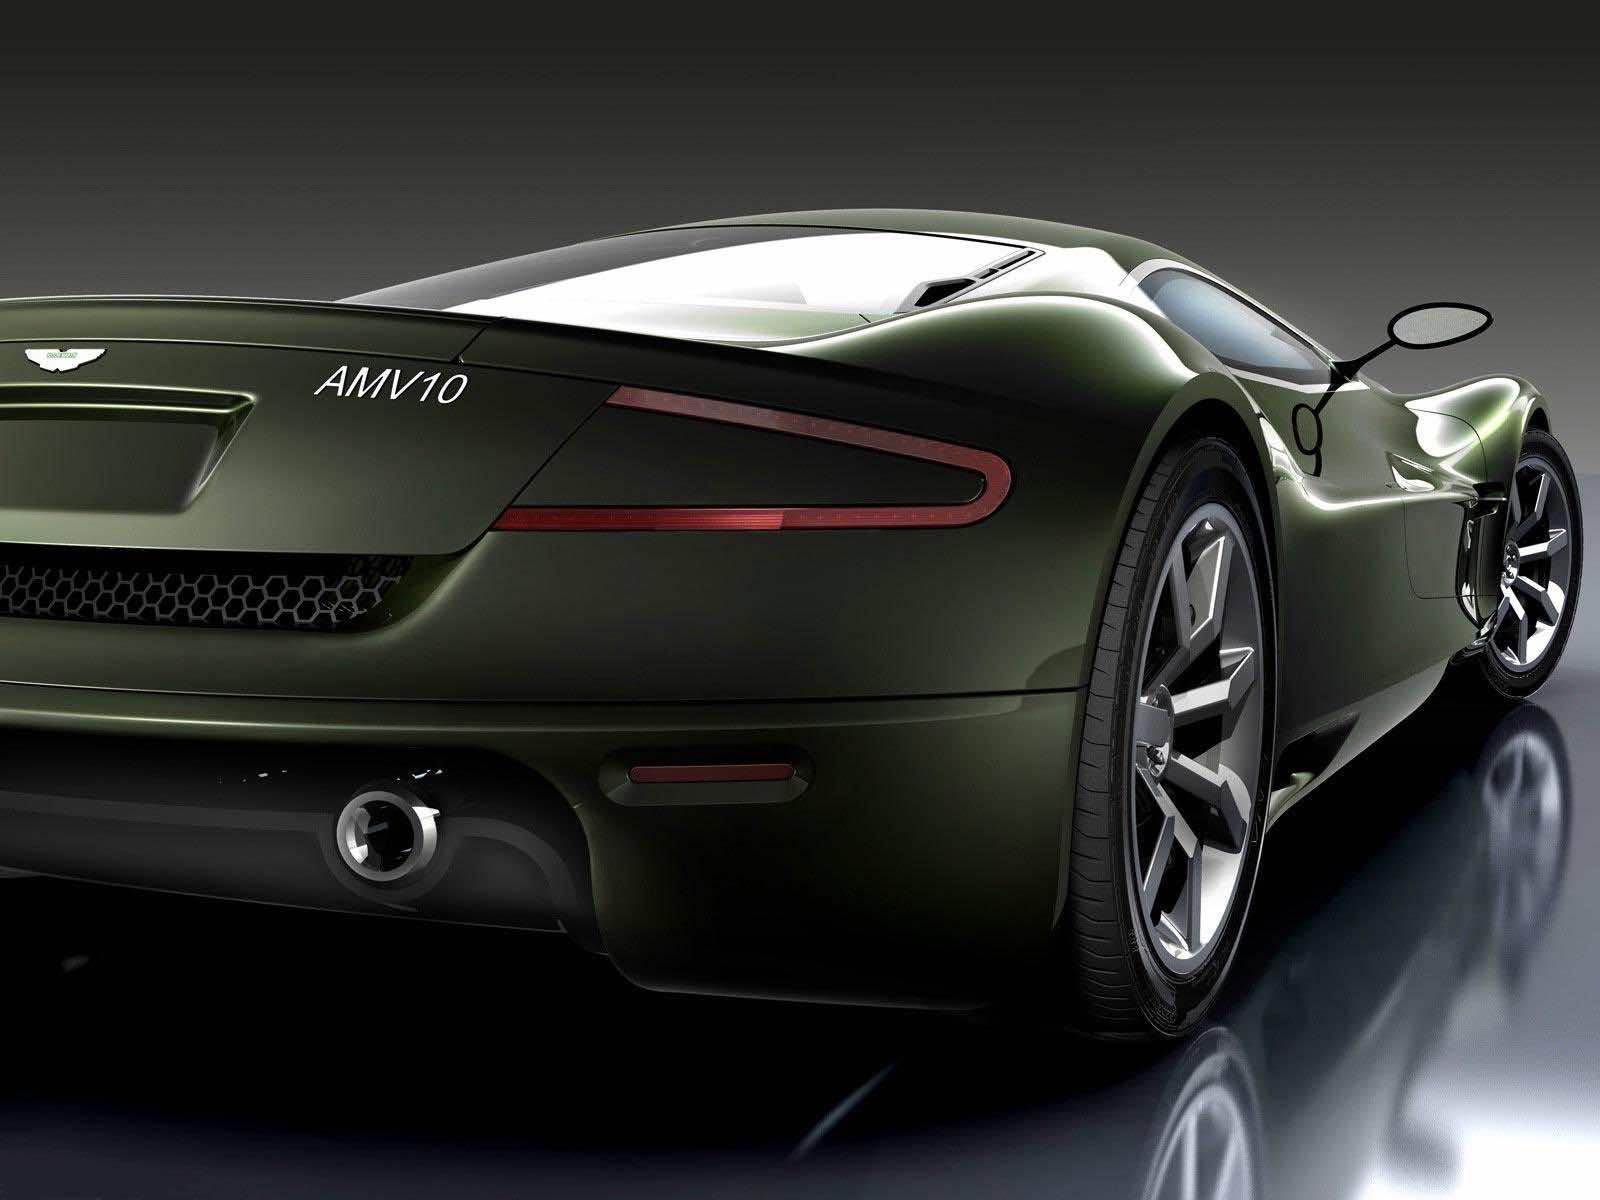 49 Speedy Car Wallpapers For Free Desktop Download